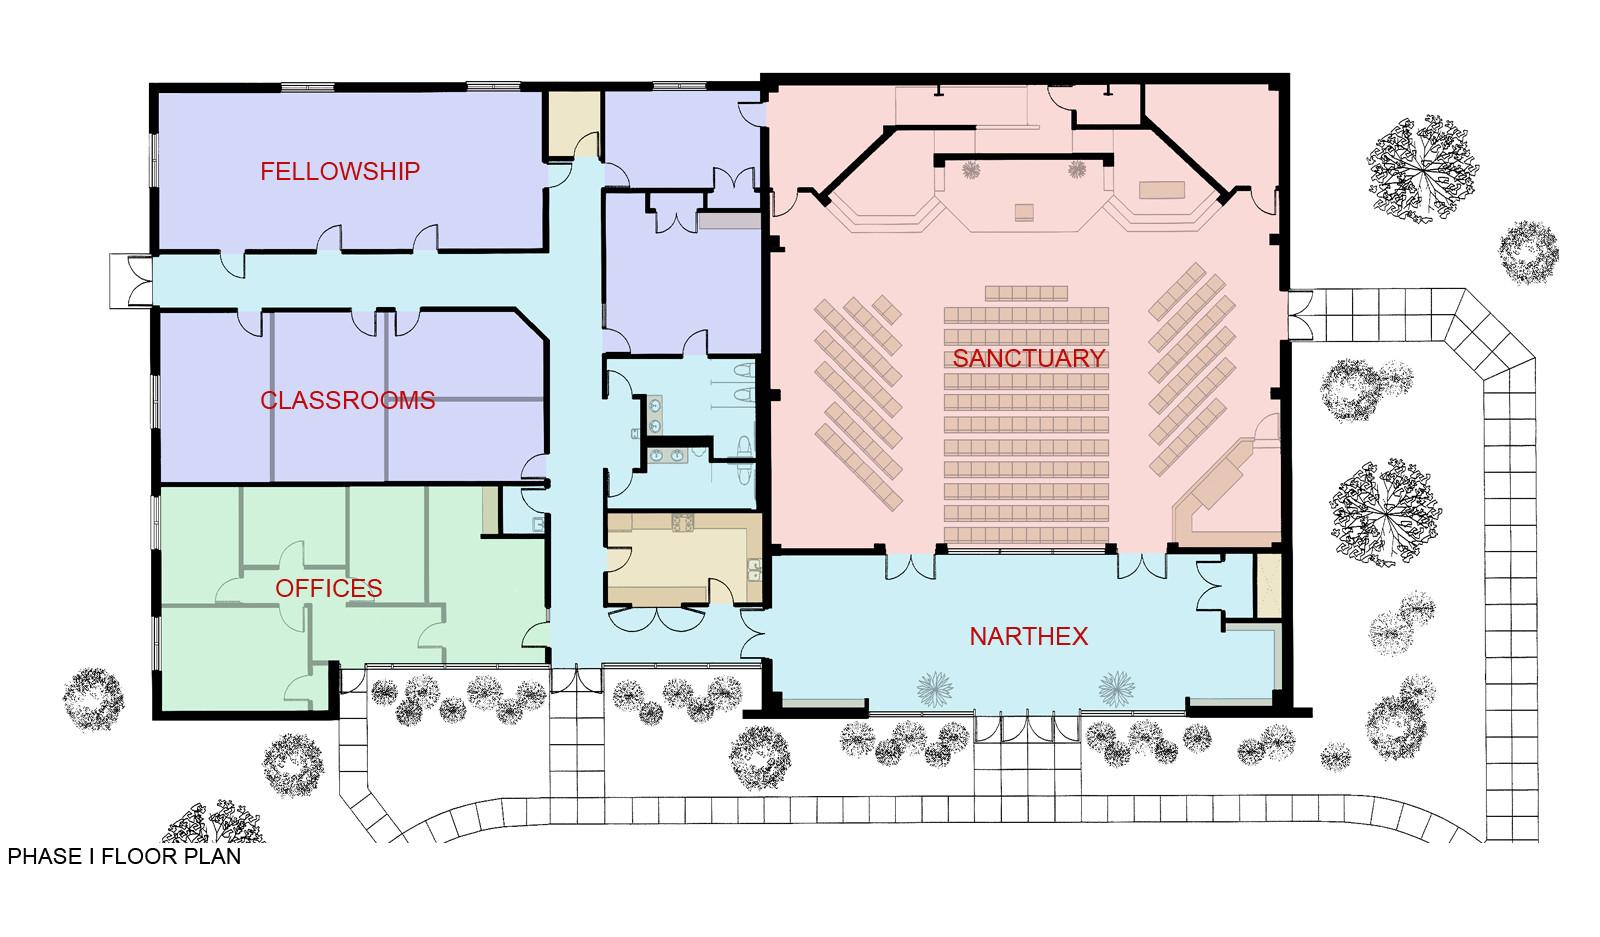 Phase I Floor Plan